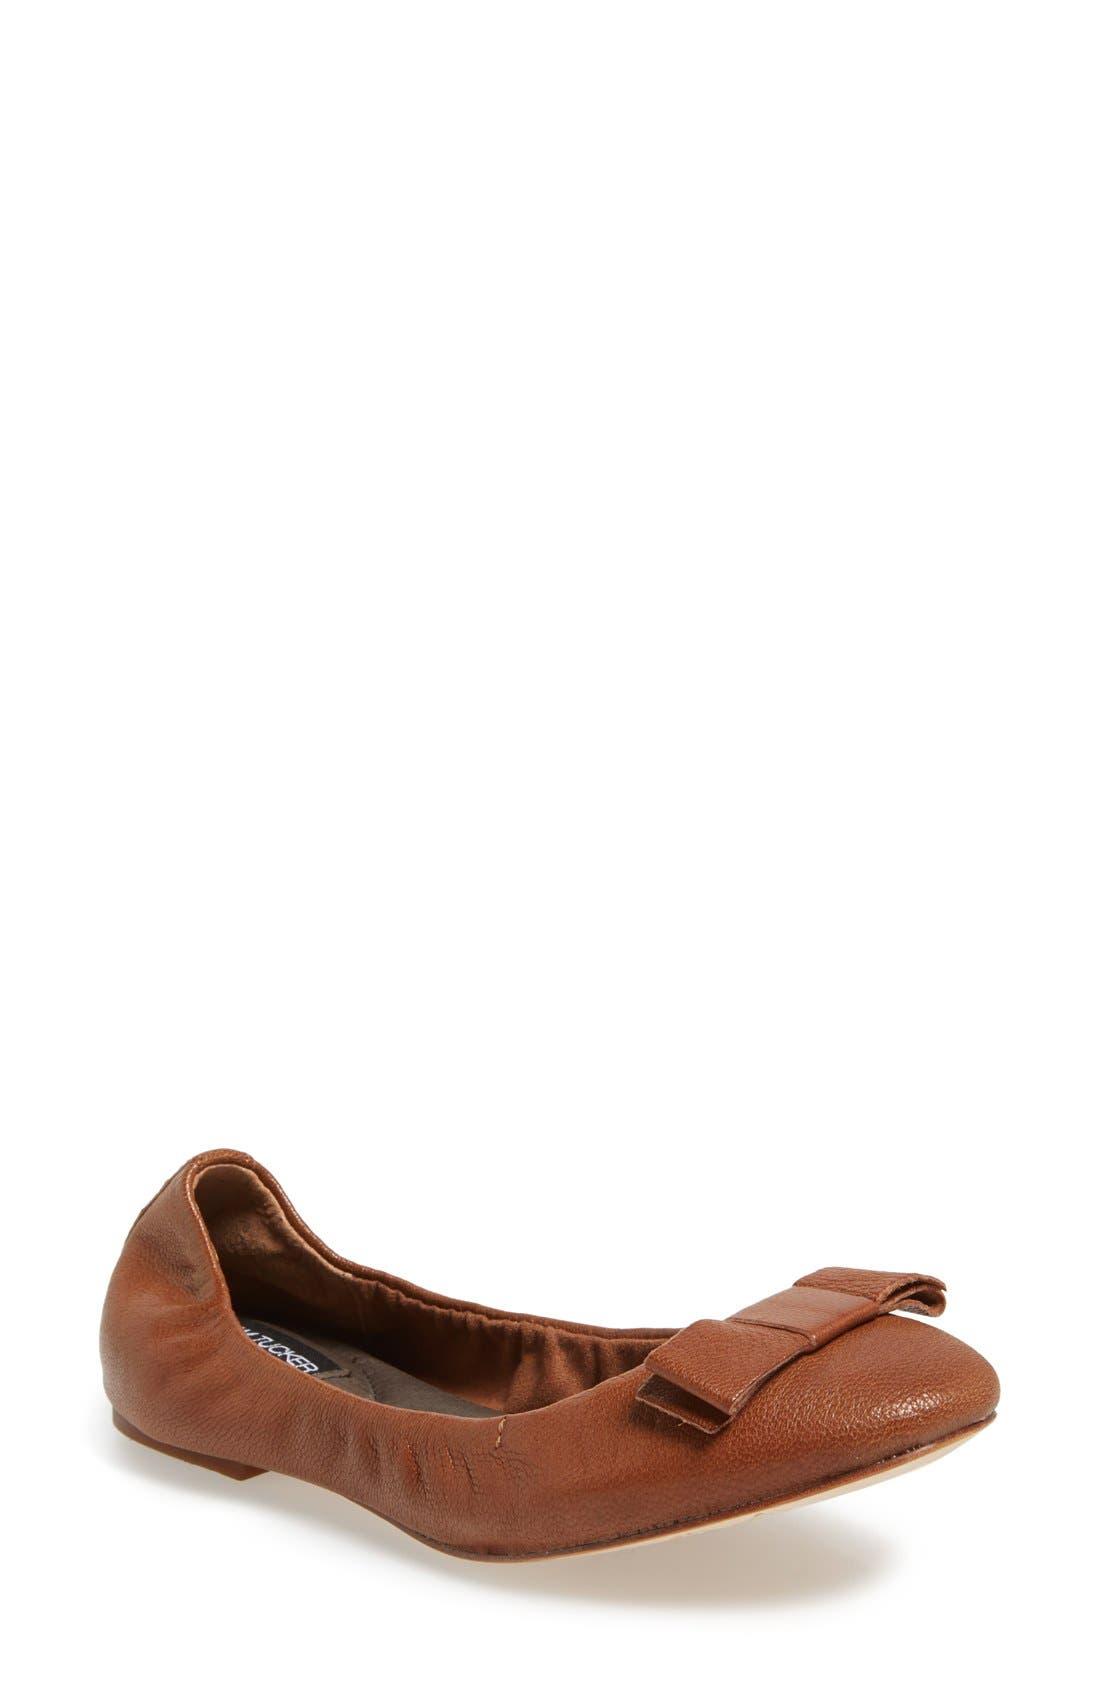 Alternate Image 1 Selected - Adam Tucker Me Too 'Prescott' Leather Ballet Flat (Women)